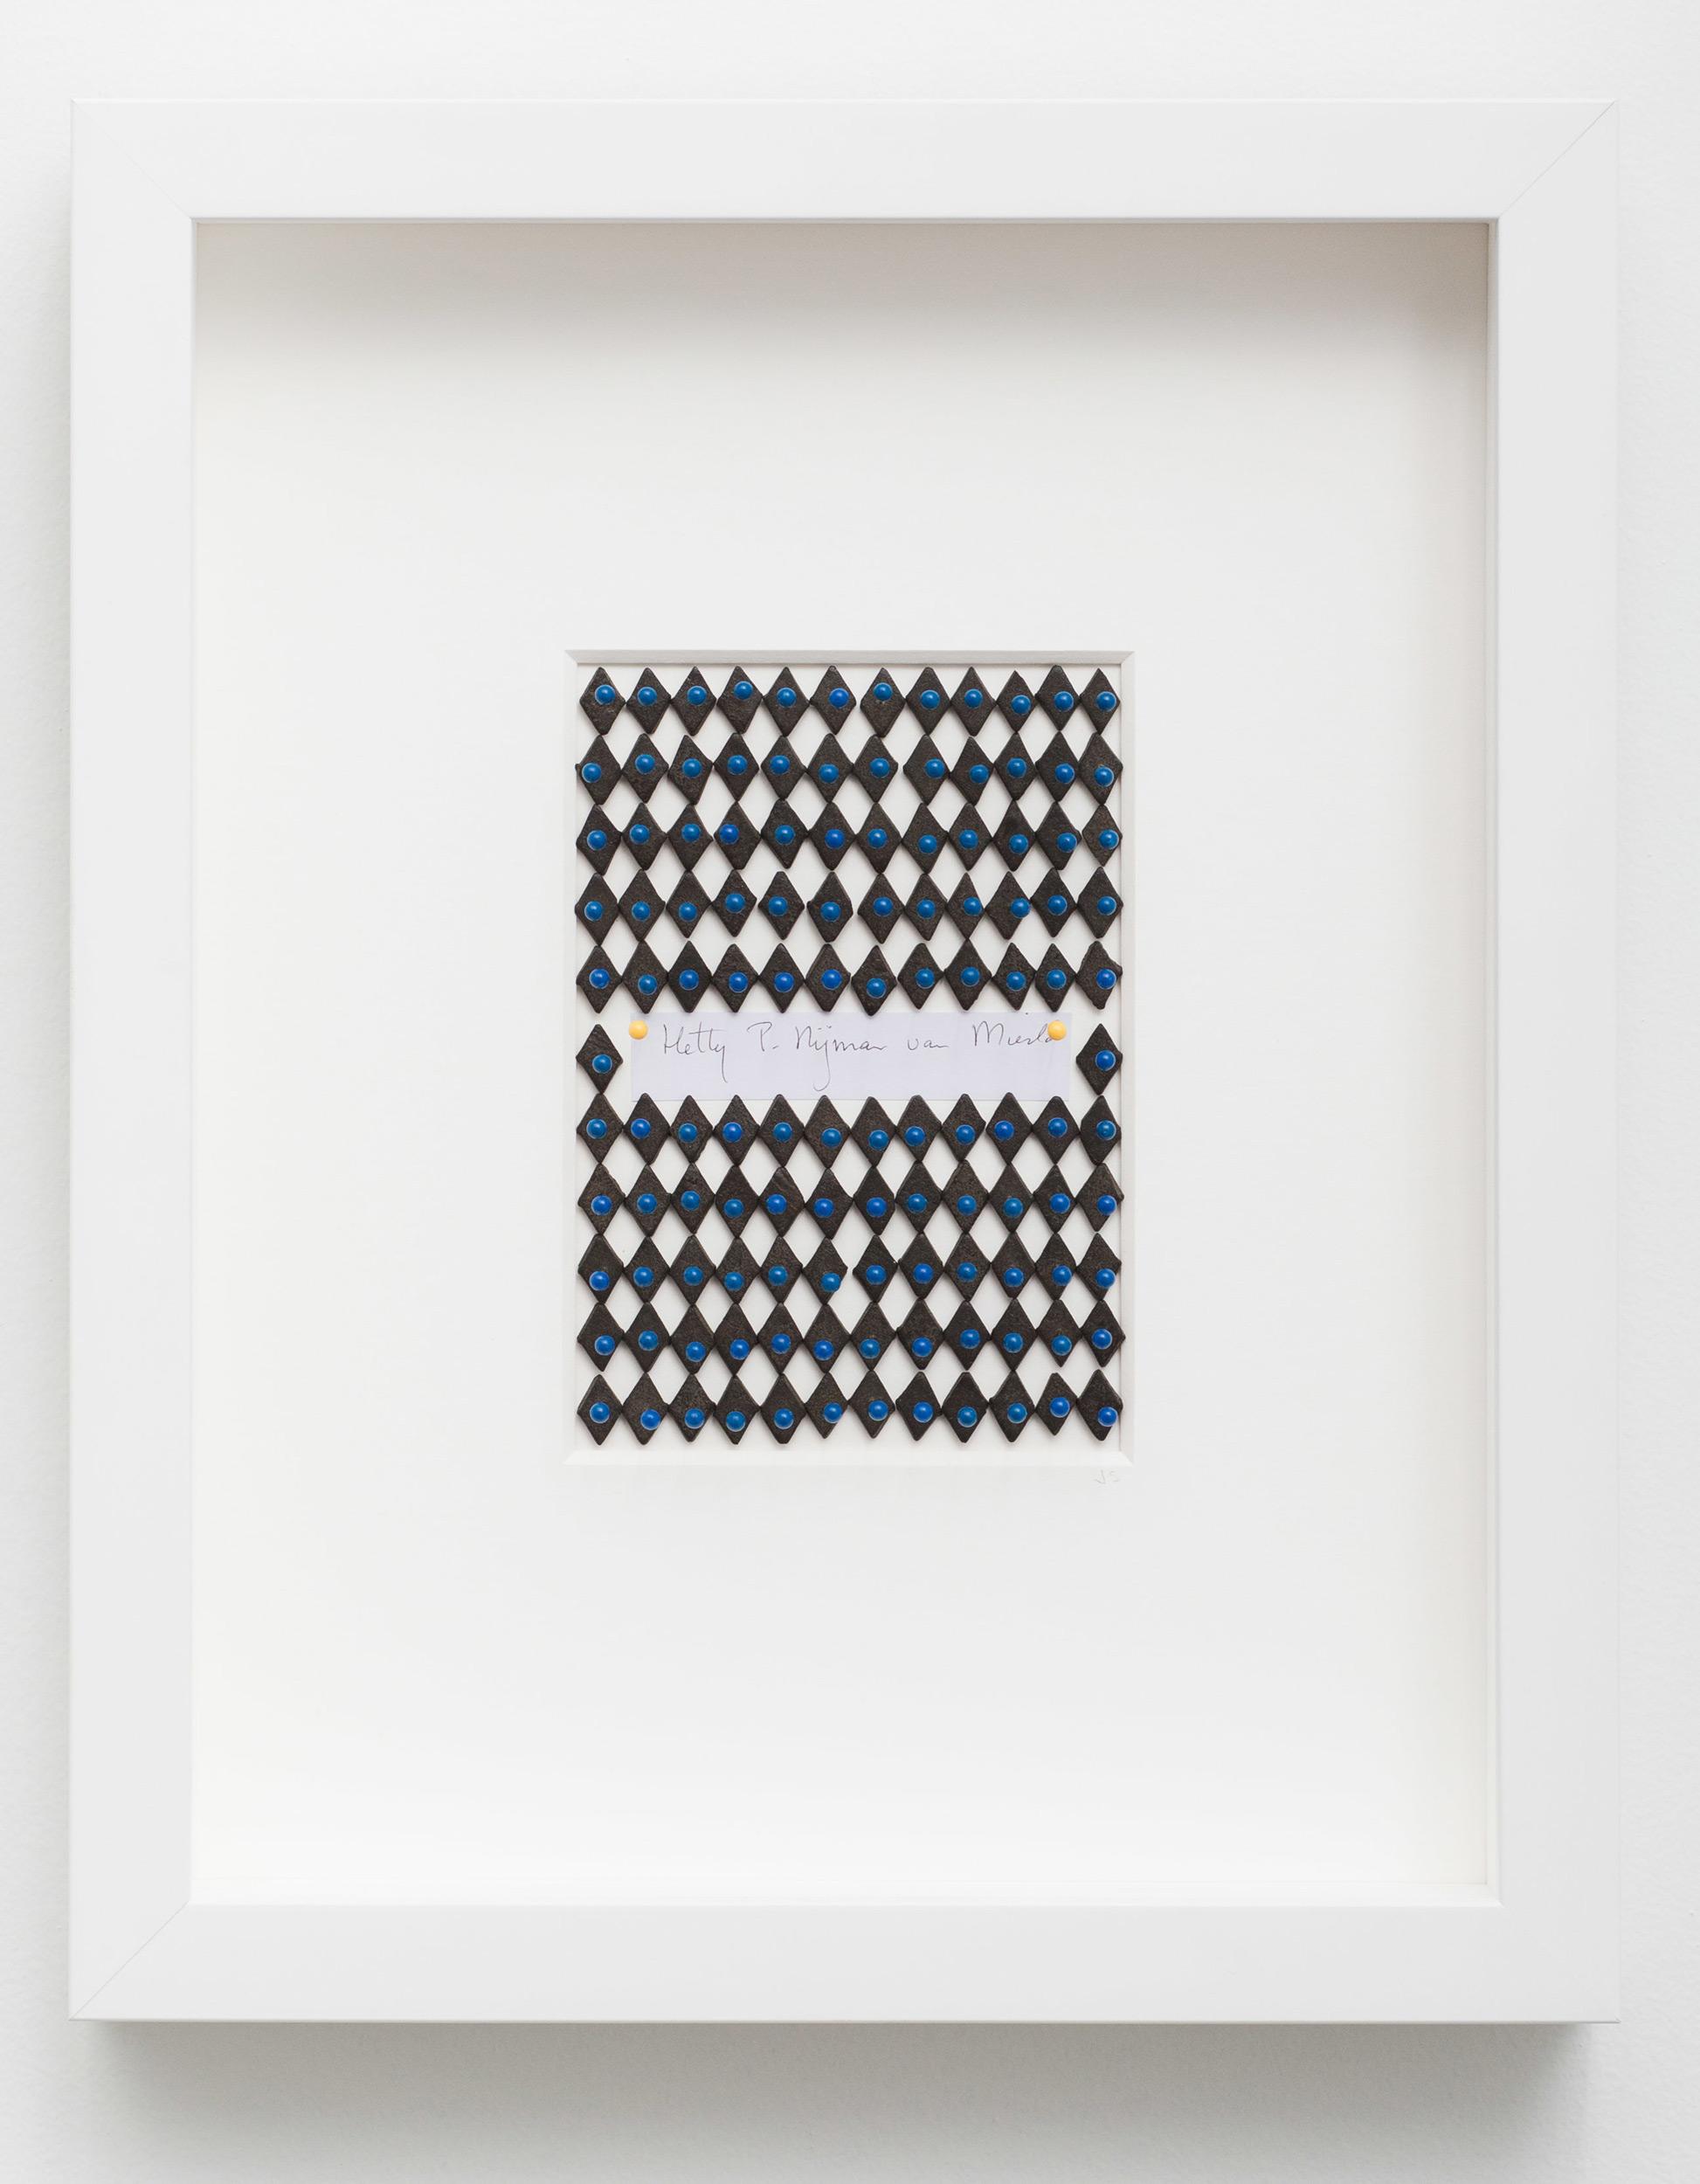 Jacqueline-Surdell-Artist-Installation-Kerk-Straat-Orwellian-Offspring-Work-09.jpg